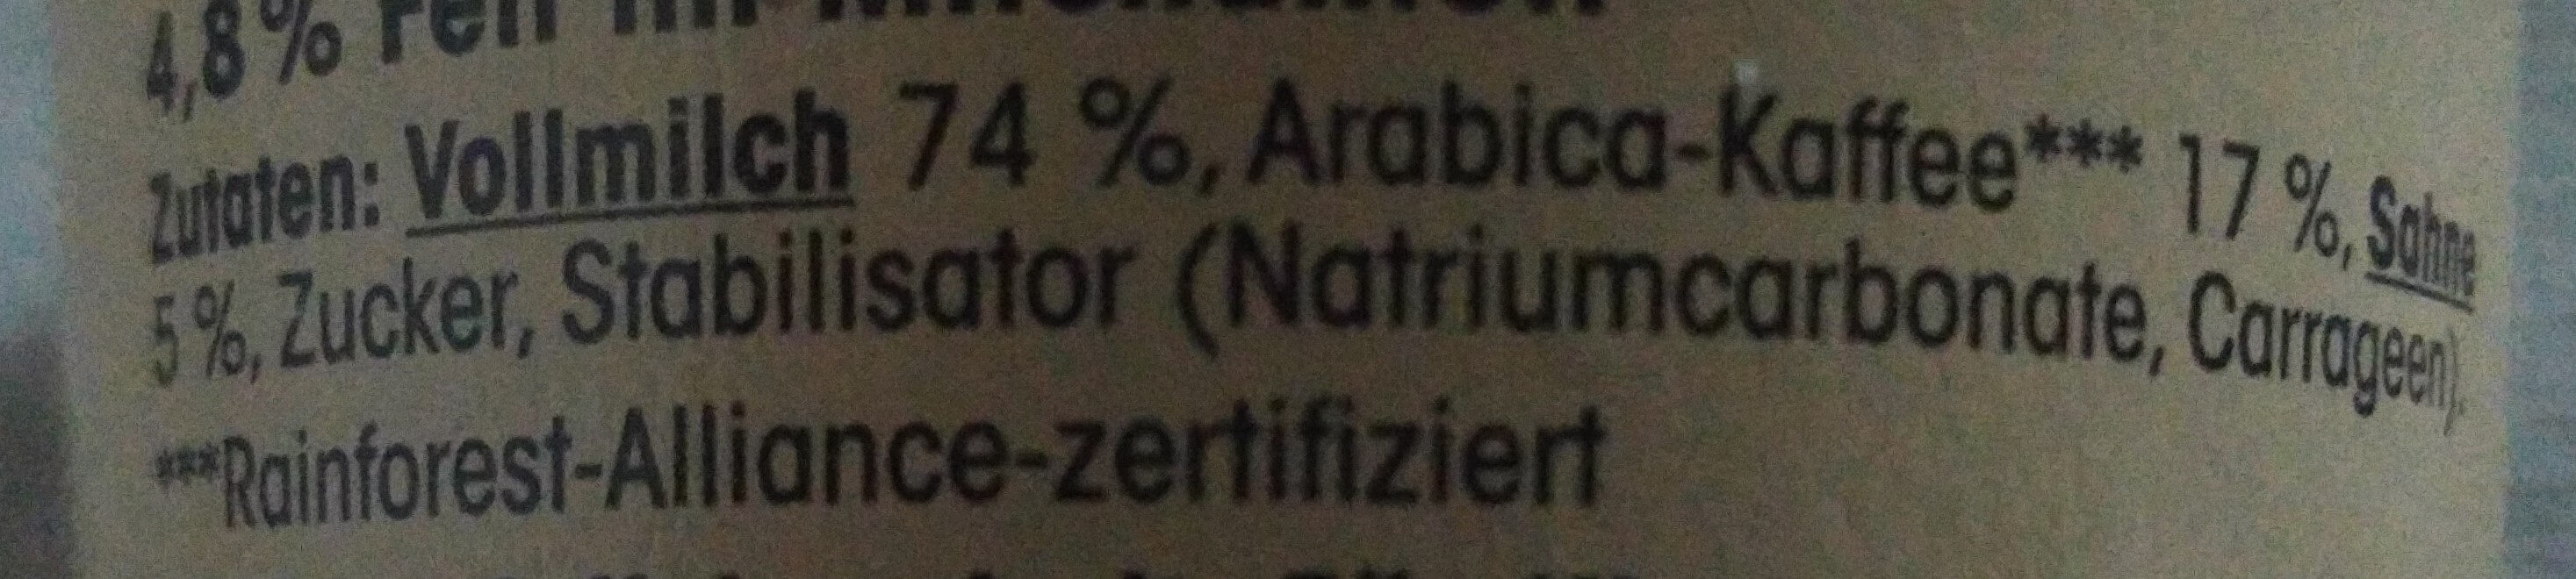 Latte Macchiato - Ingredients - de